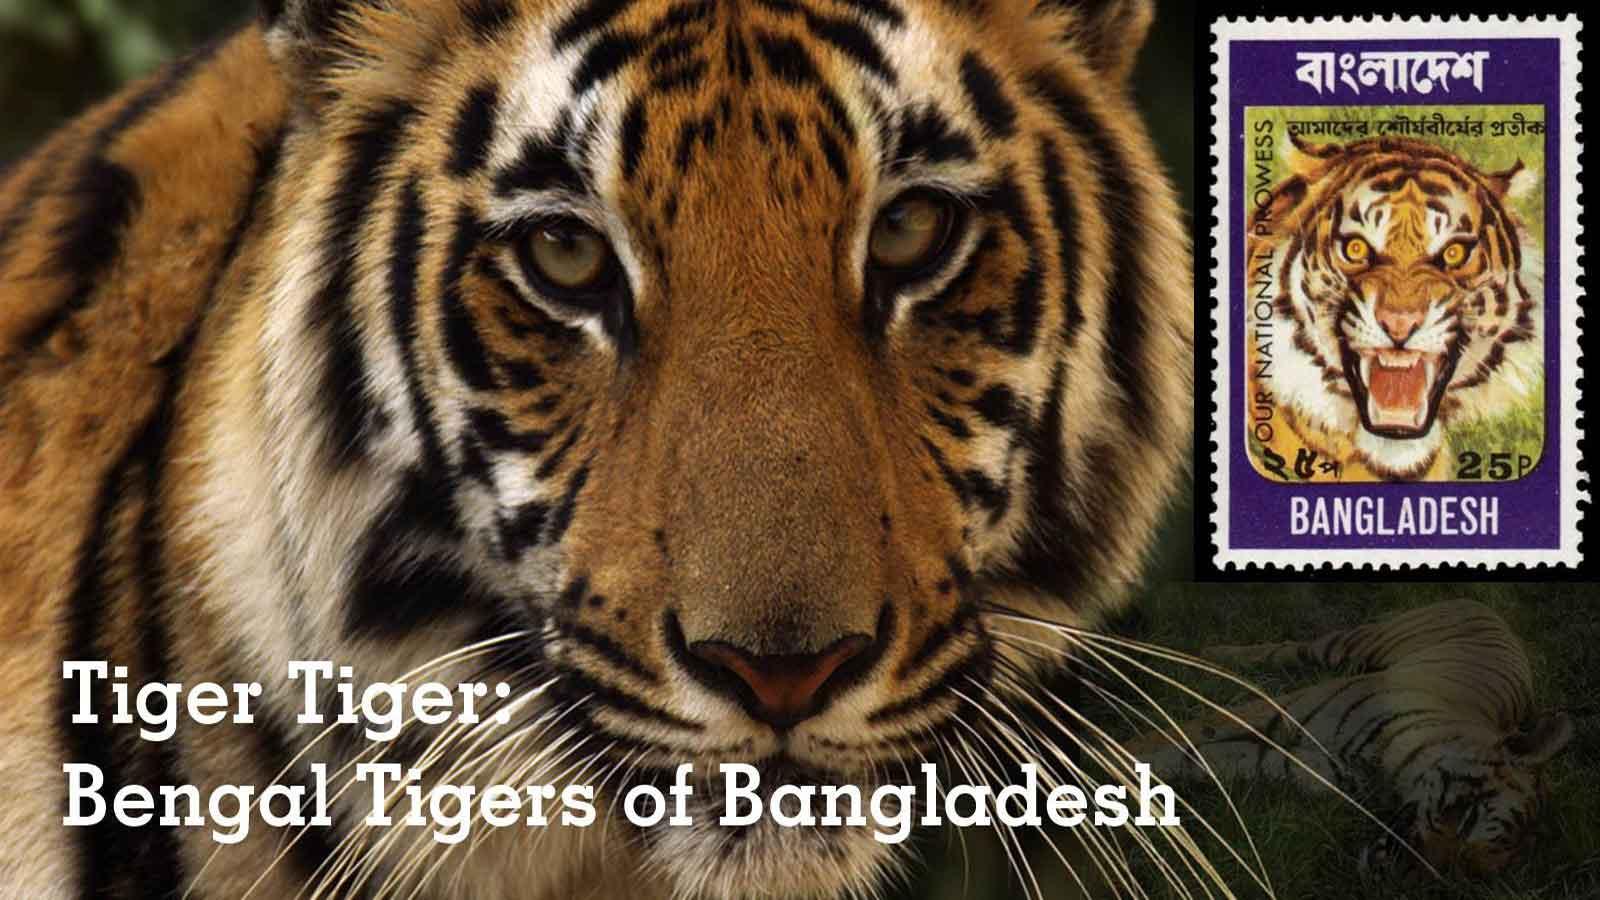 Tiger-Tiger-Bengal-Tigers-of-Bangladesh